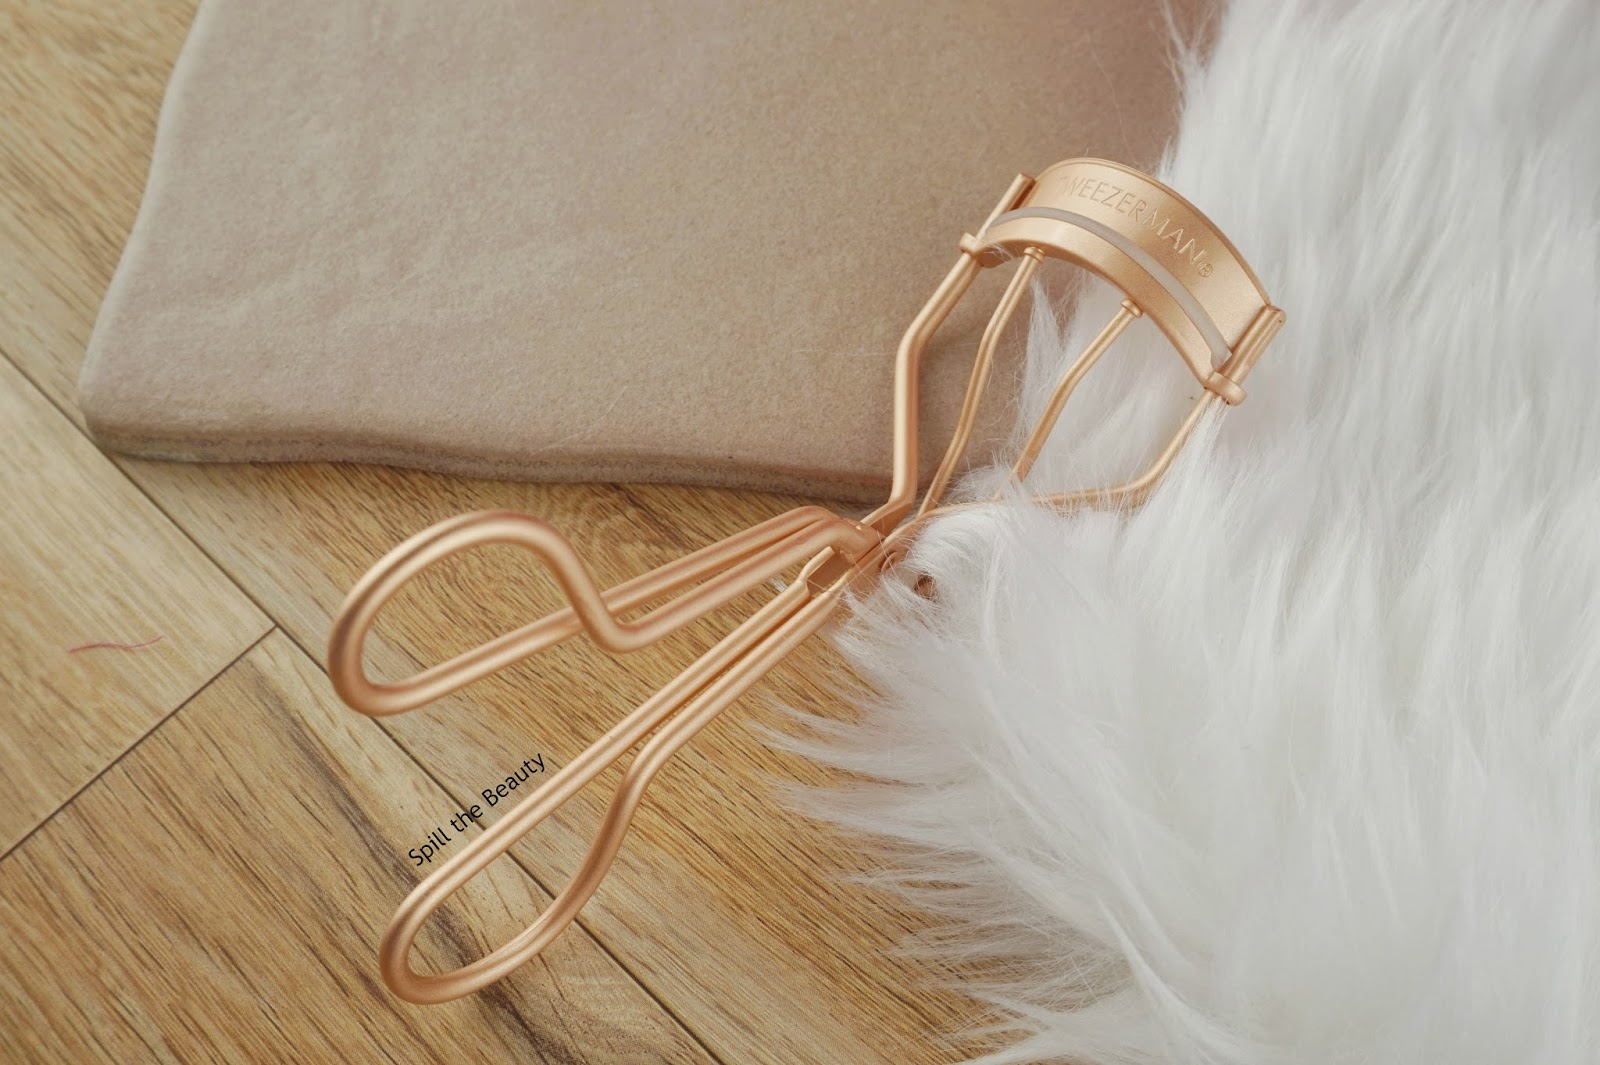 tweezerman Rose Gold Classic Curler